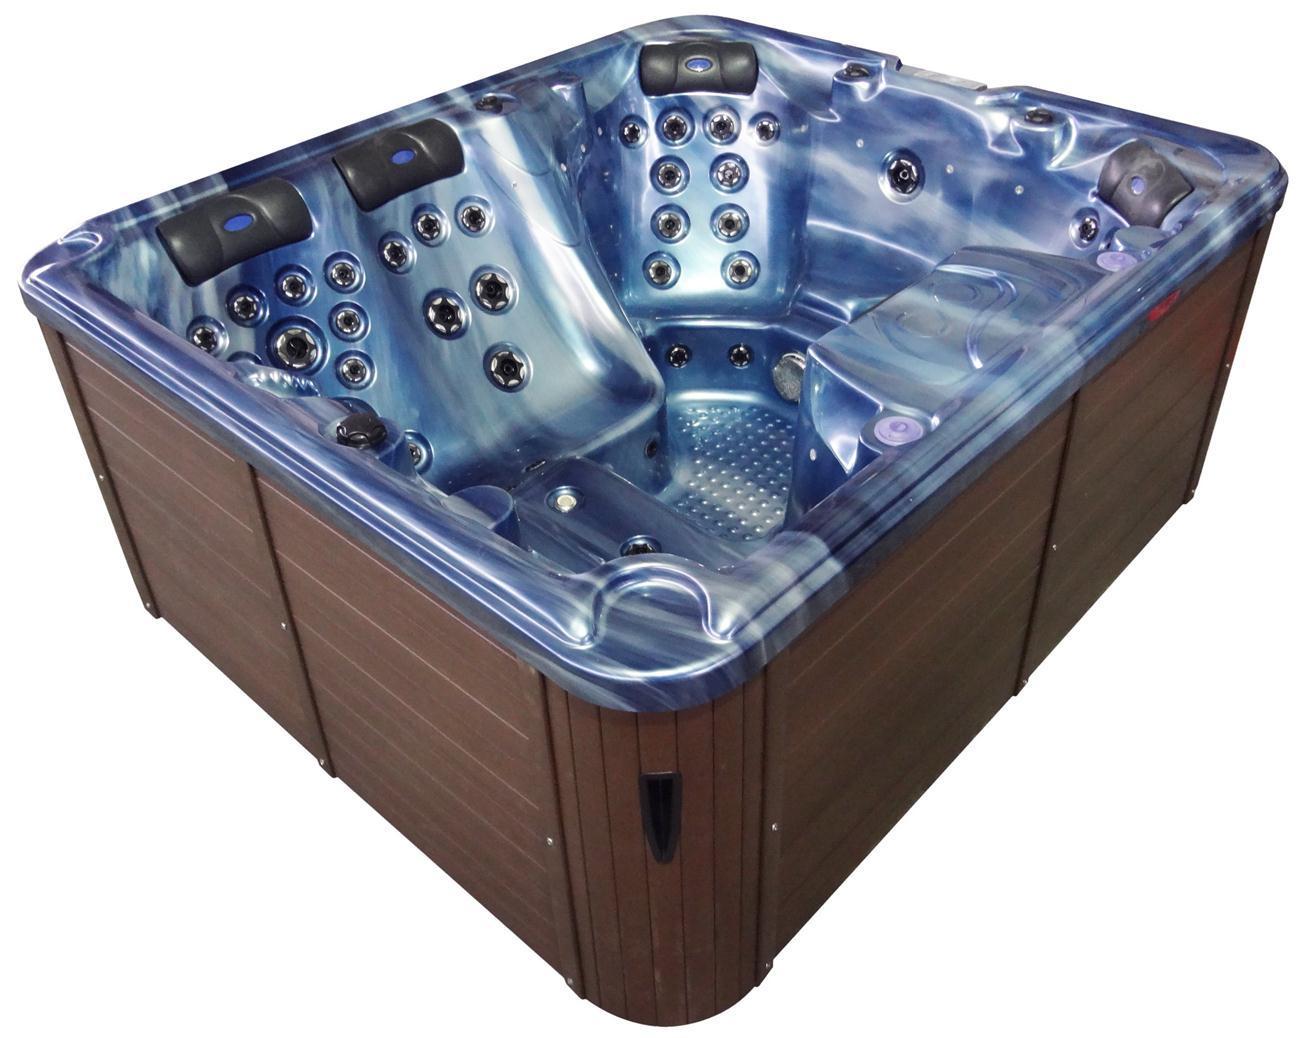 China Hot Sale Massage Outdoor SPA Balboa System Hot Tub Jacuzzi ...